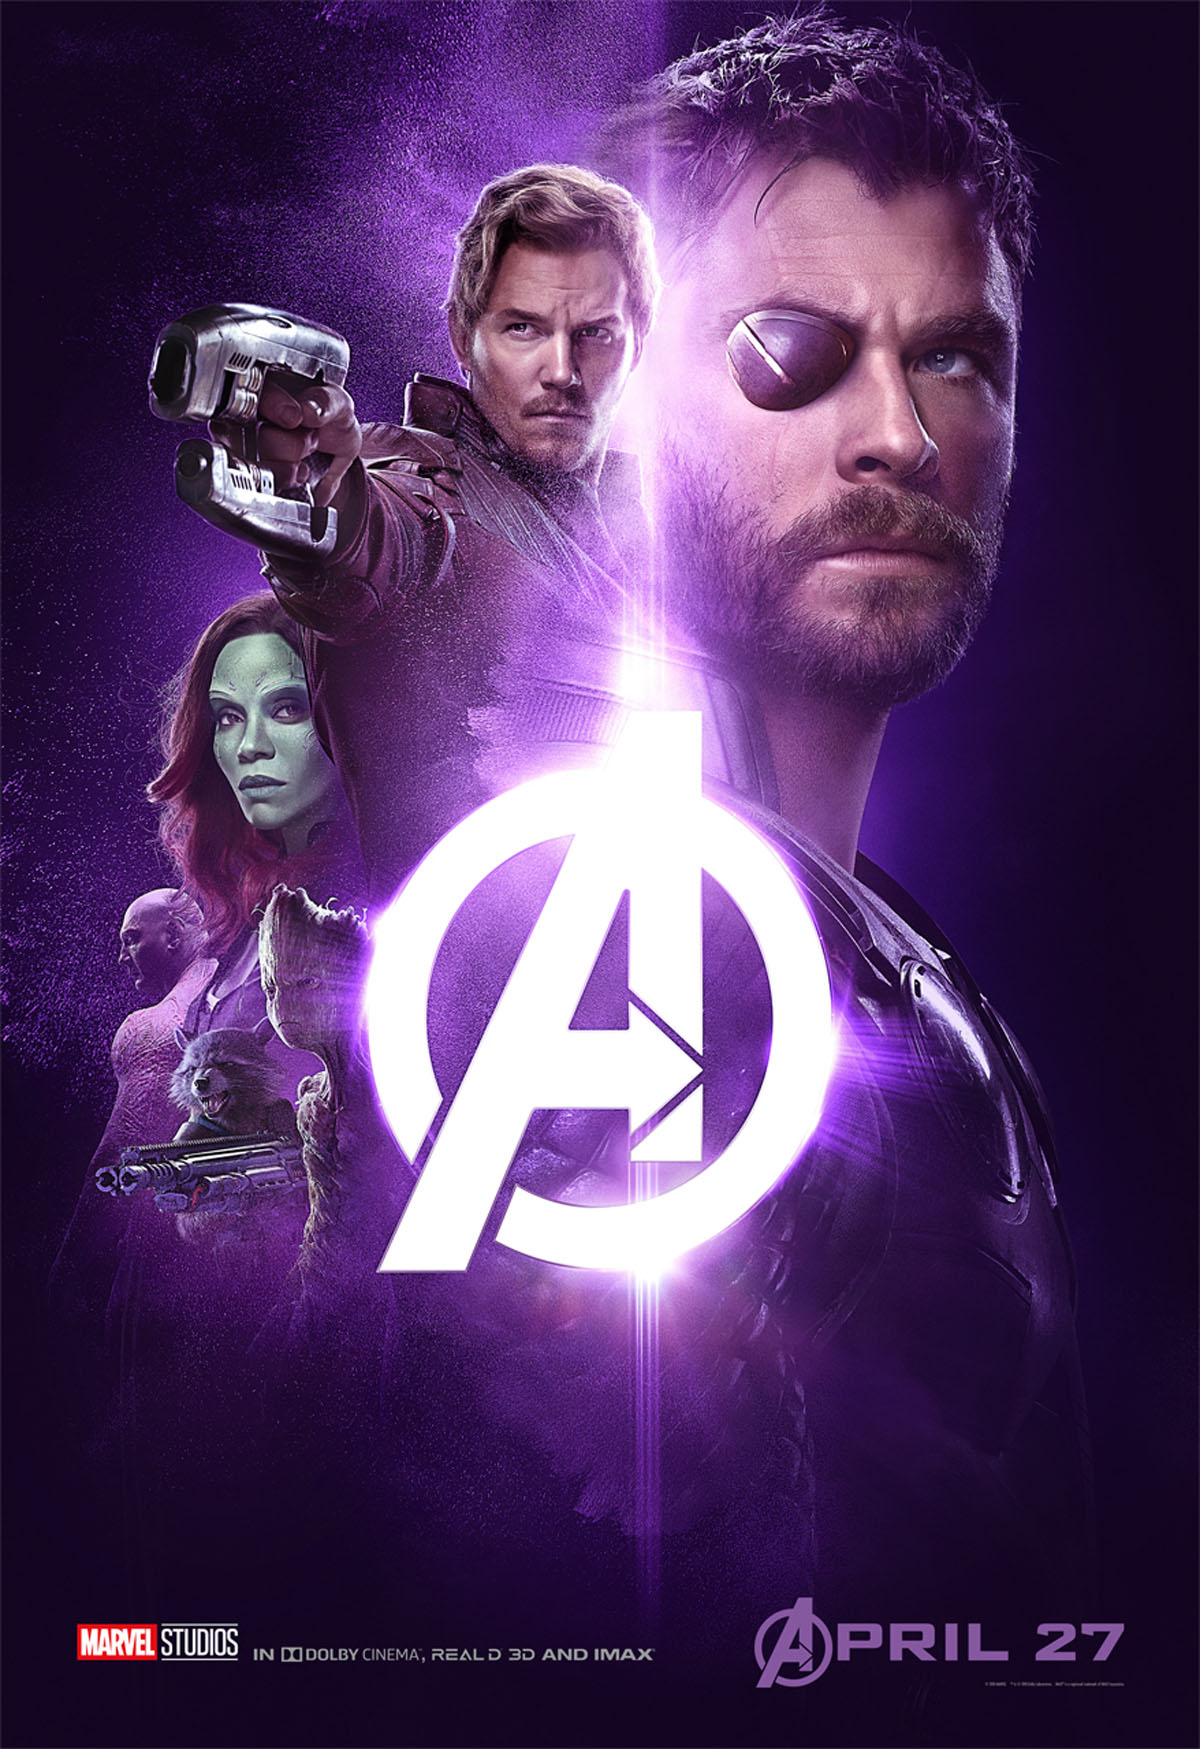 szmk_marvel_avengers_infinity_war_bosszuallok_vegtelen_haboru_thanos_vasember_hulk_thor_spiderman_ironman_amerika_kapitany_6.jpg